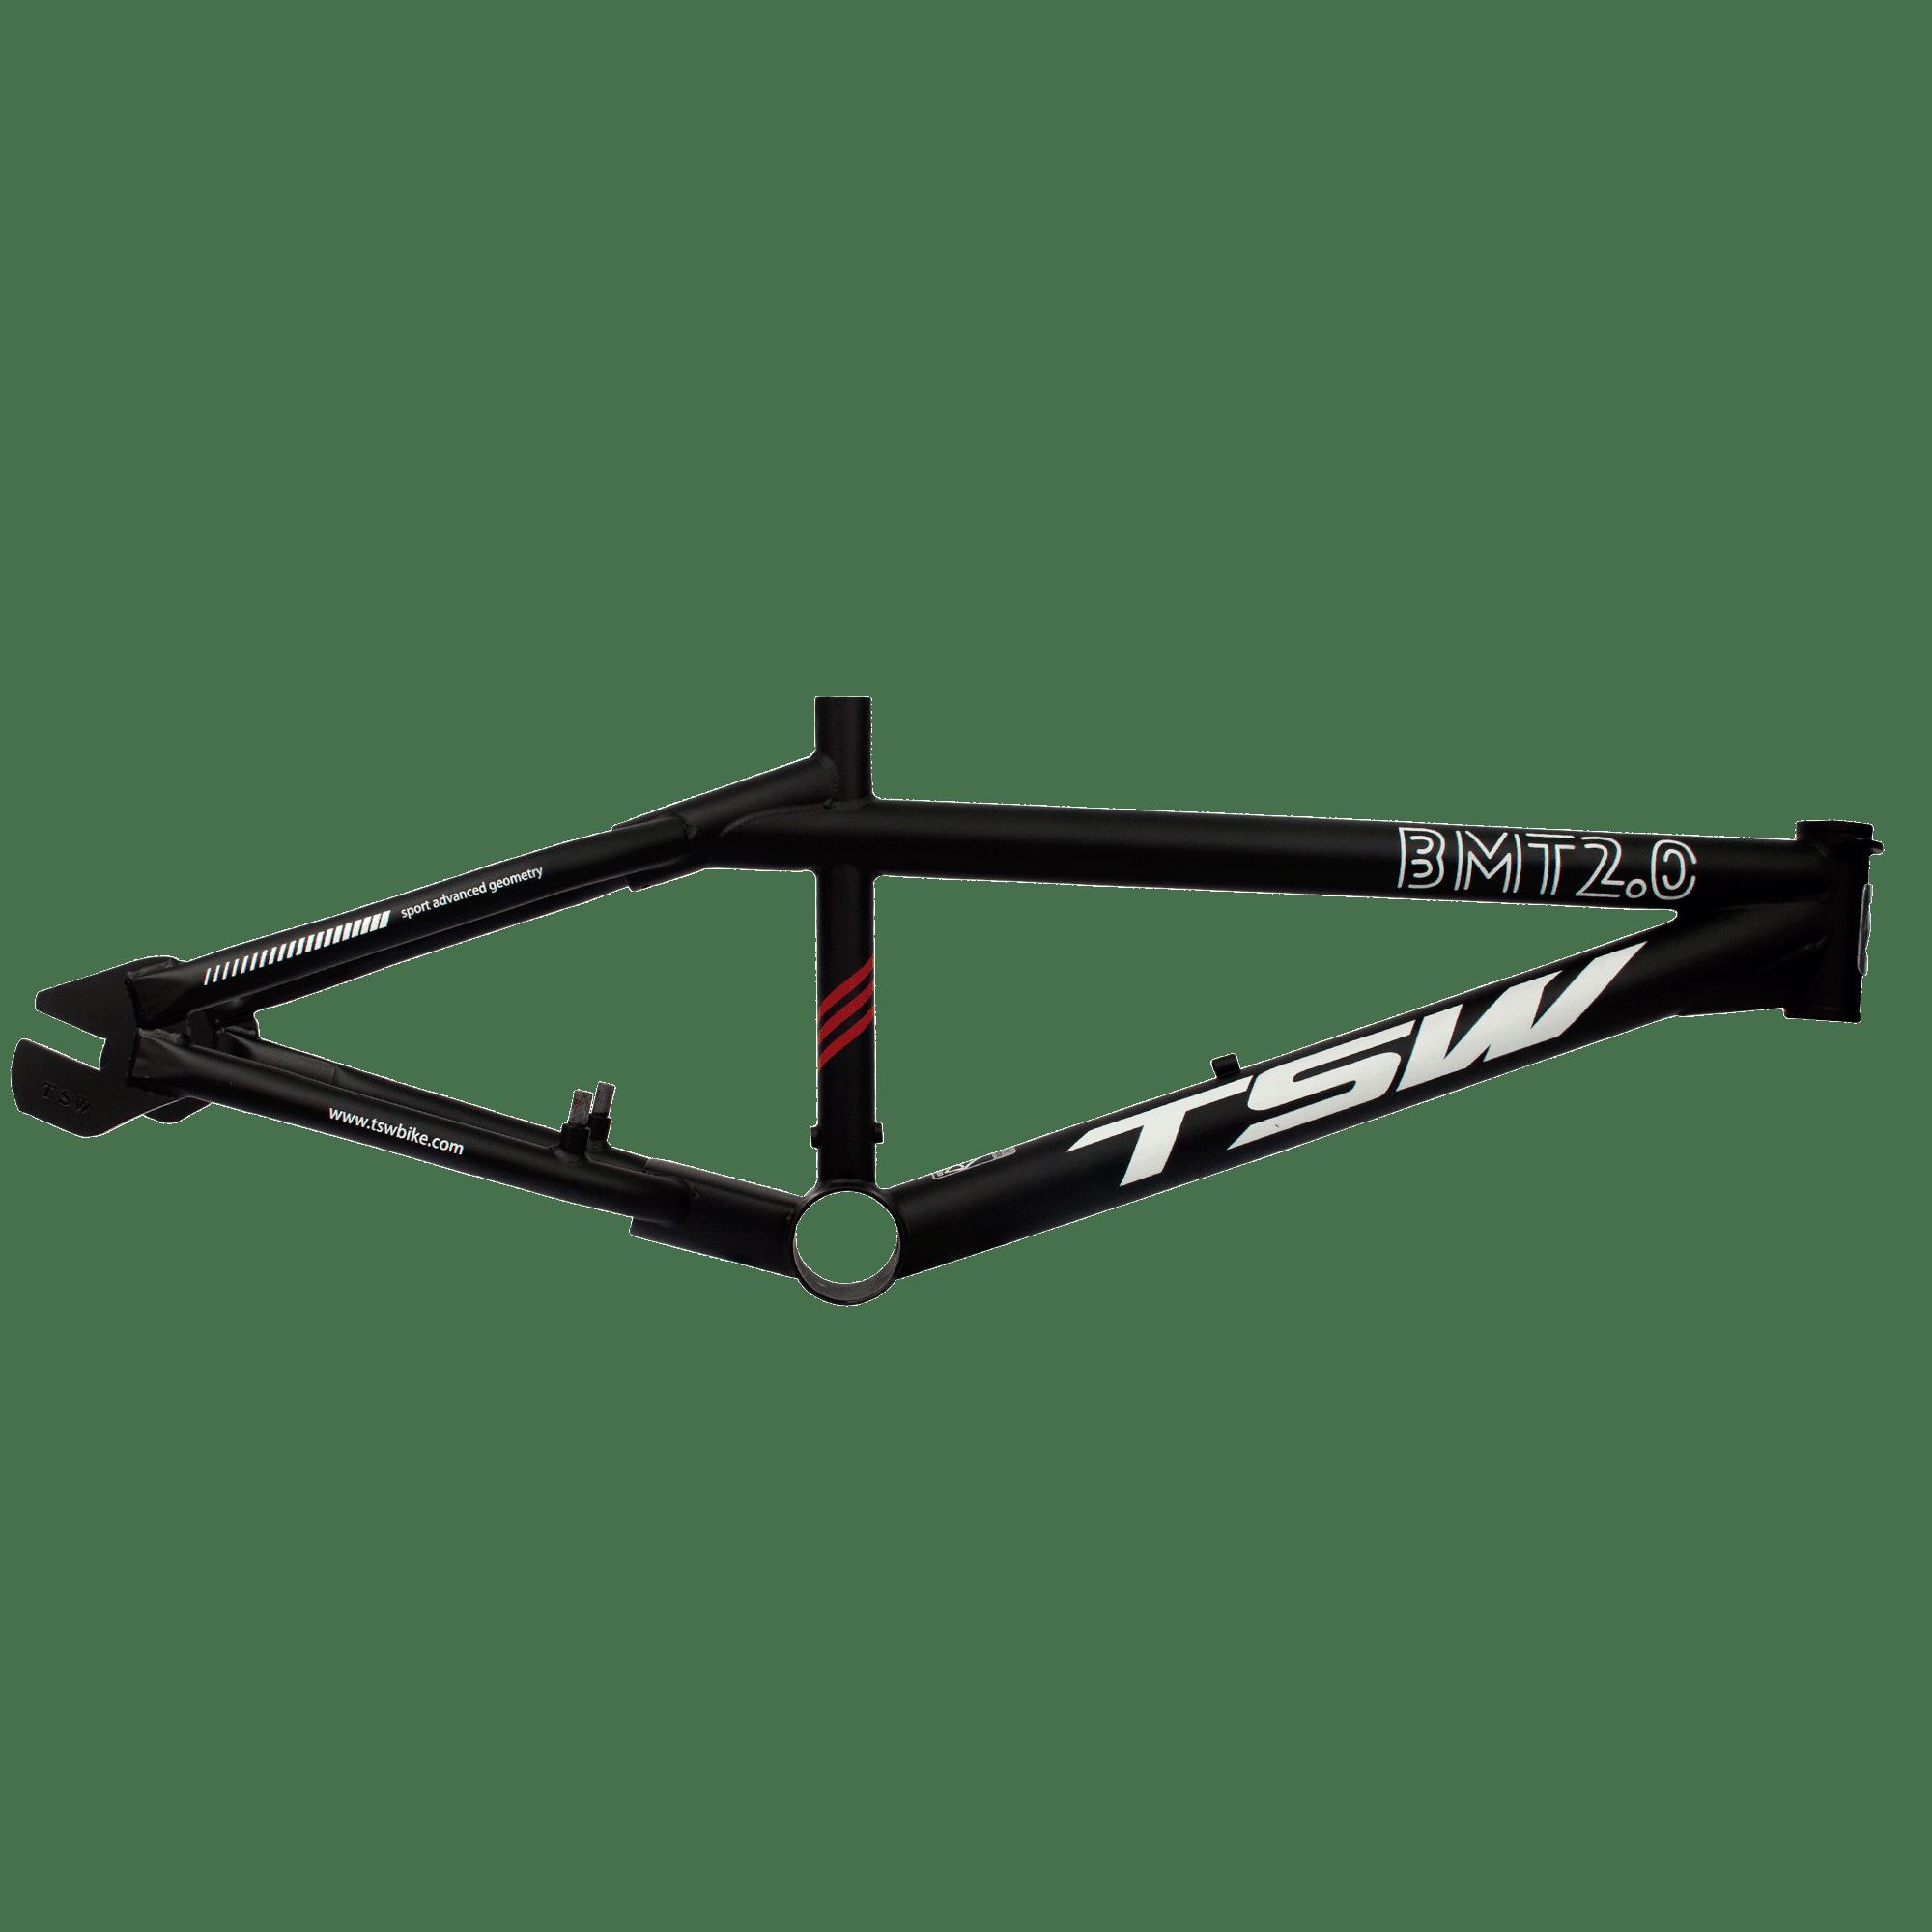 BMT 2.0 BMX Freestyle 6